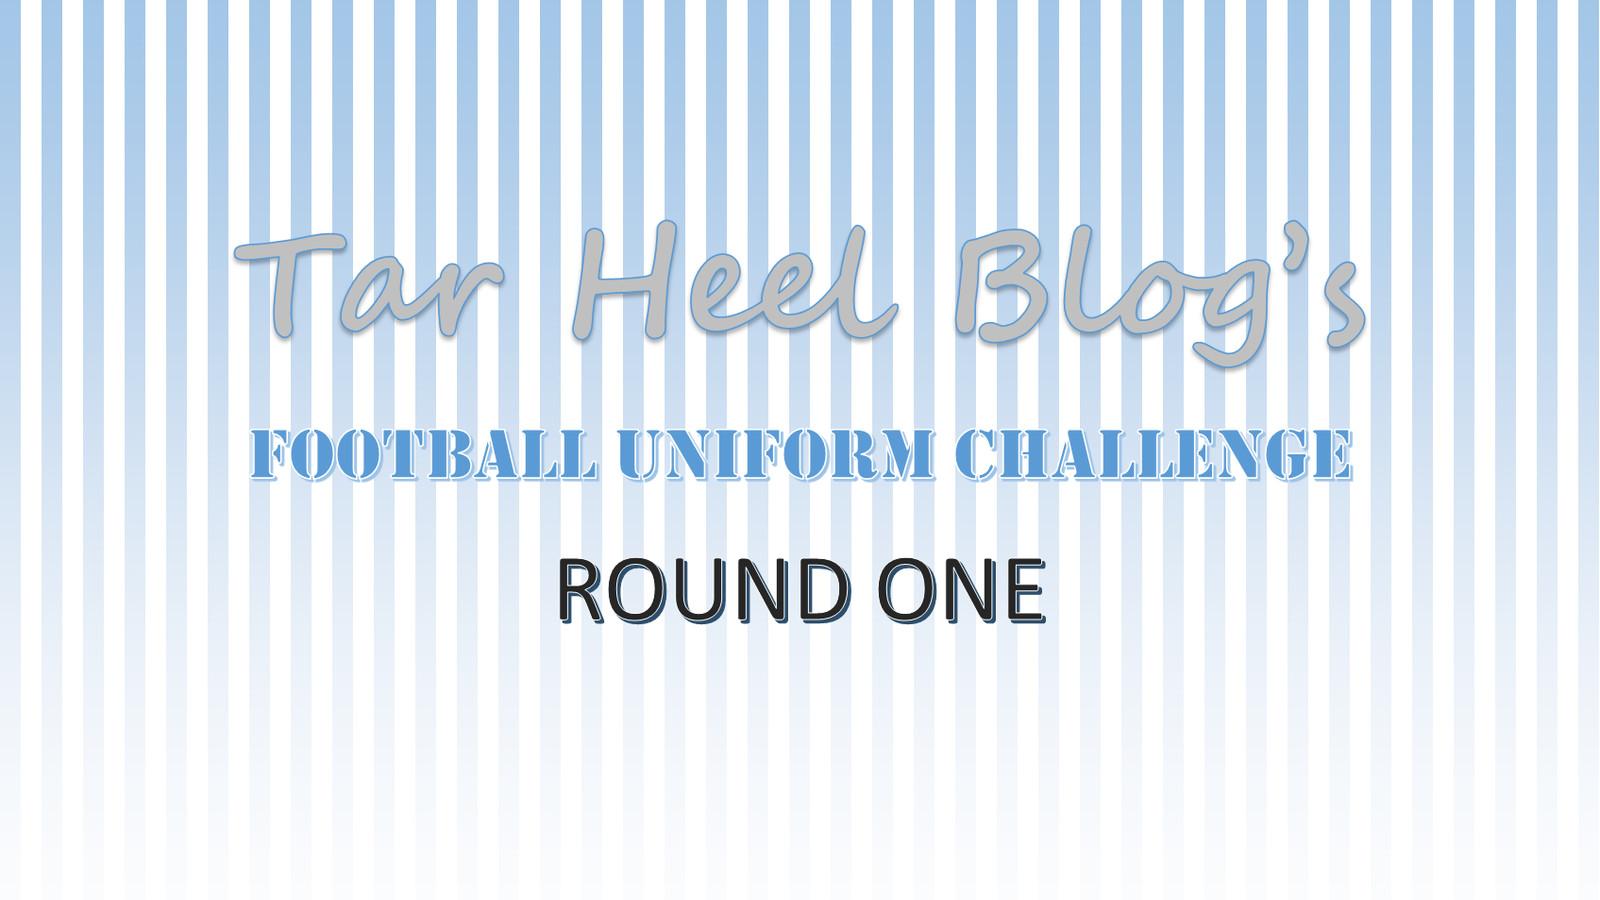 Thb_football_uniform_challenge_round_one.0